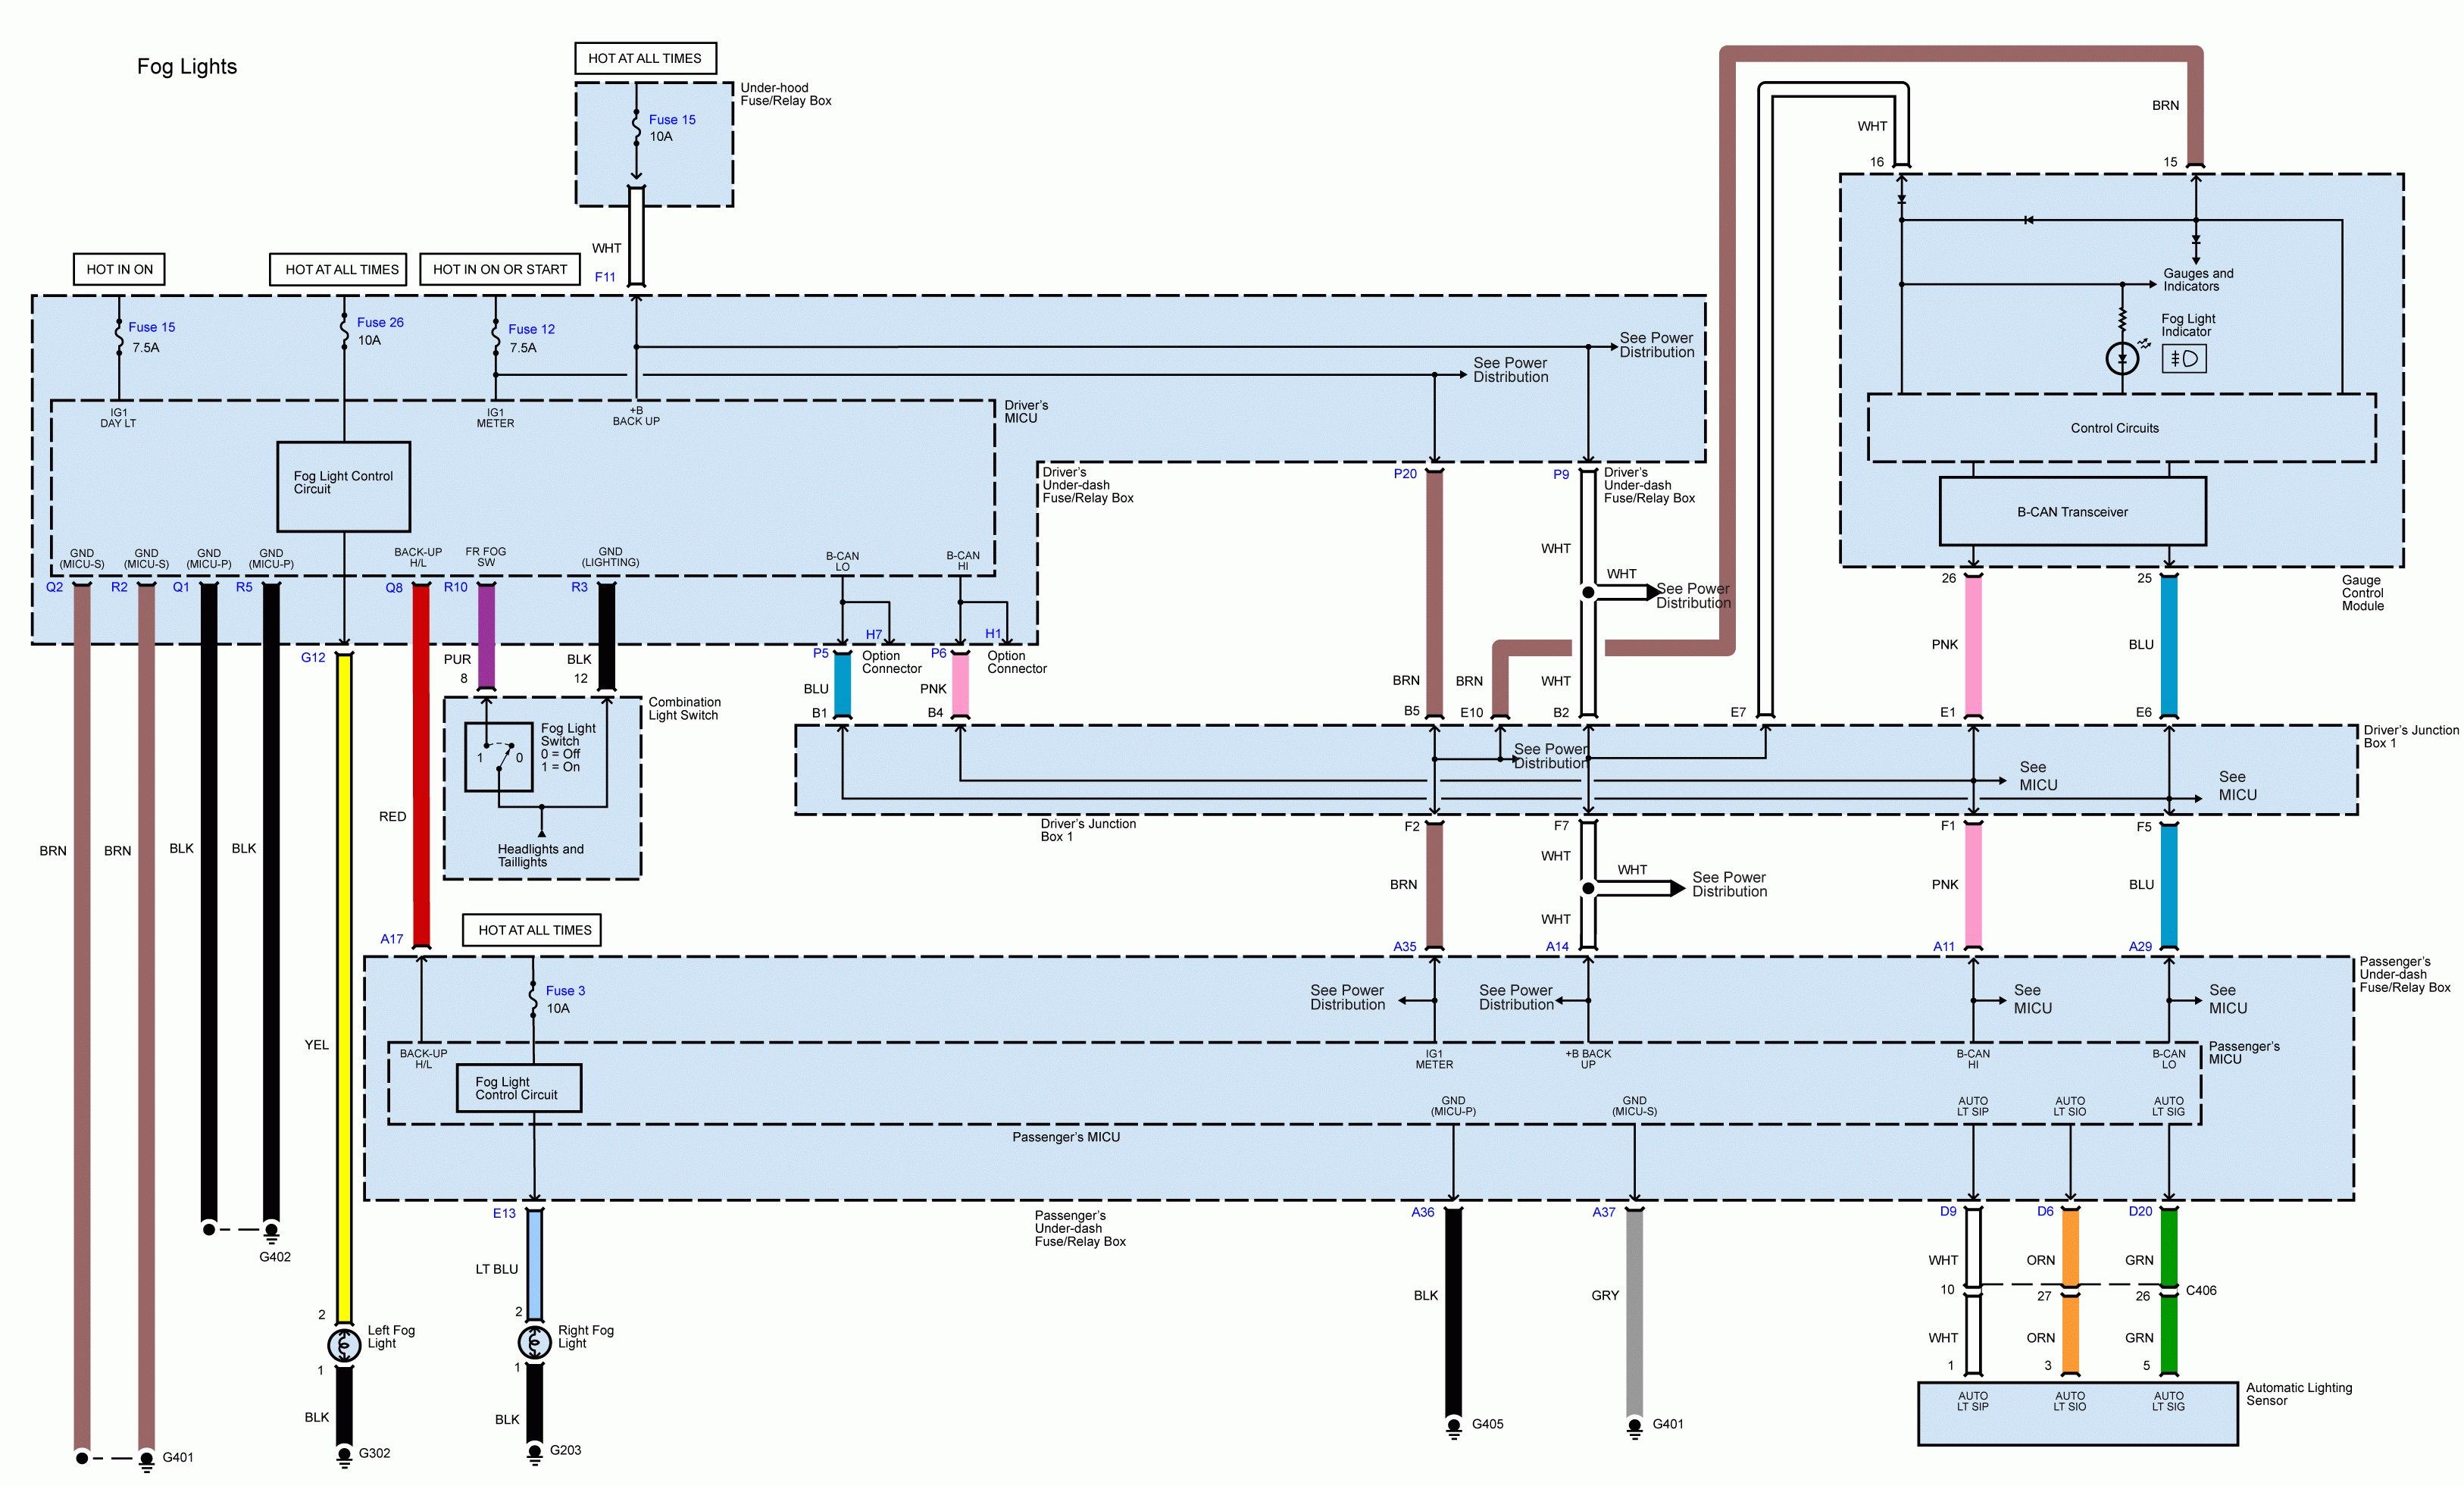 Acura TL (2011) - wiring diagrams - exterior lighting ... on cigarette lighter diagram, fog machine, chevy hhr diagram, headlight adjustment diagram, 2006 hhr parts diagram, mazda 3 parts diagram, a/c compressor diagram, f150 trailer plug diagram, telephone network diagram, solex carburetor diagram, spark plugs diagram, steering box diagram, switch diagram, chevy 4x4 actuator diagram, fuse box diagram, power steering pump diagram, ford expedition diagram, magneto ignition system diagram, 2002 ford f350 fuse panel diagram, egr valve diagram,